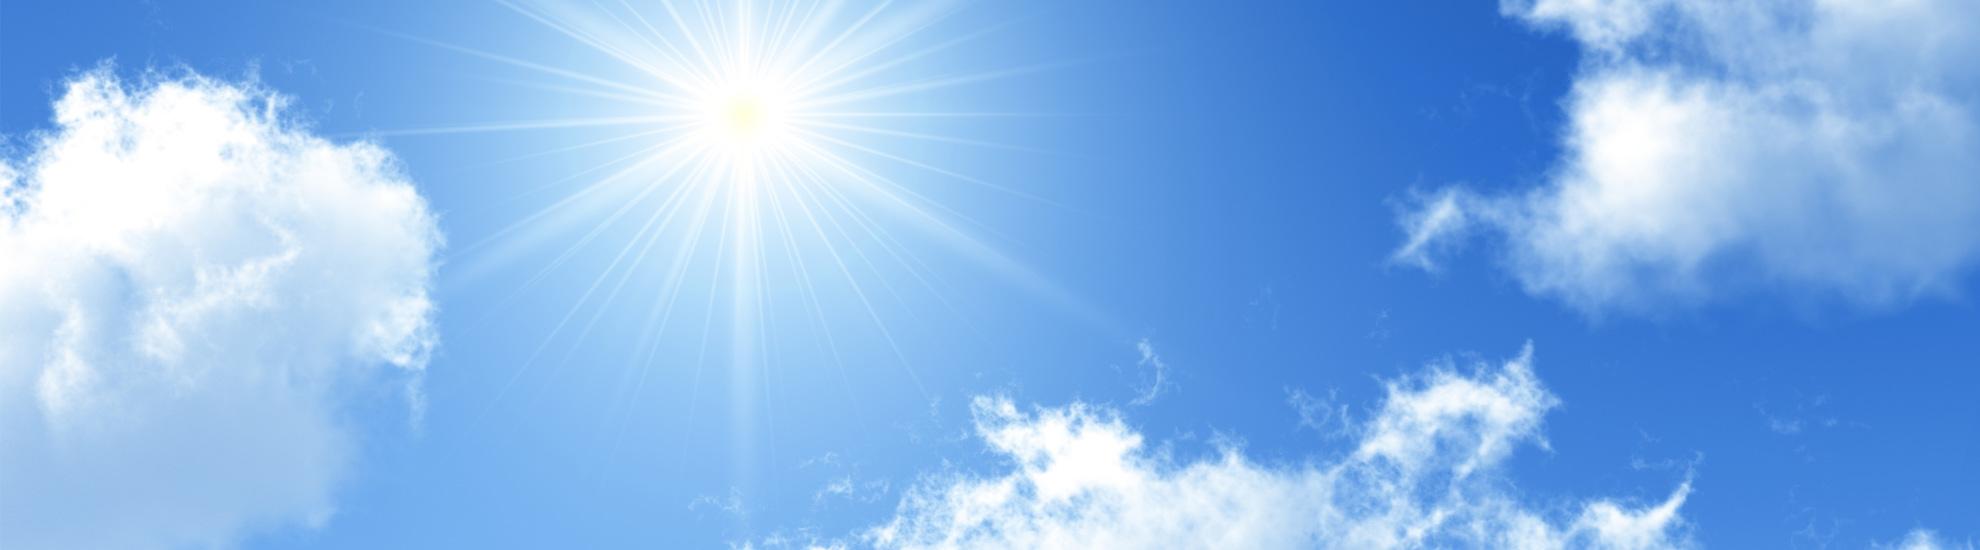 rainer-gils-solarenergie-sonne